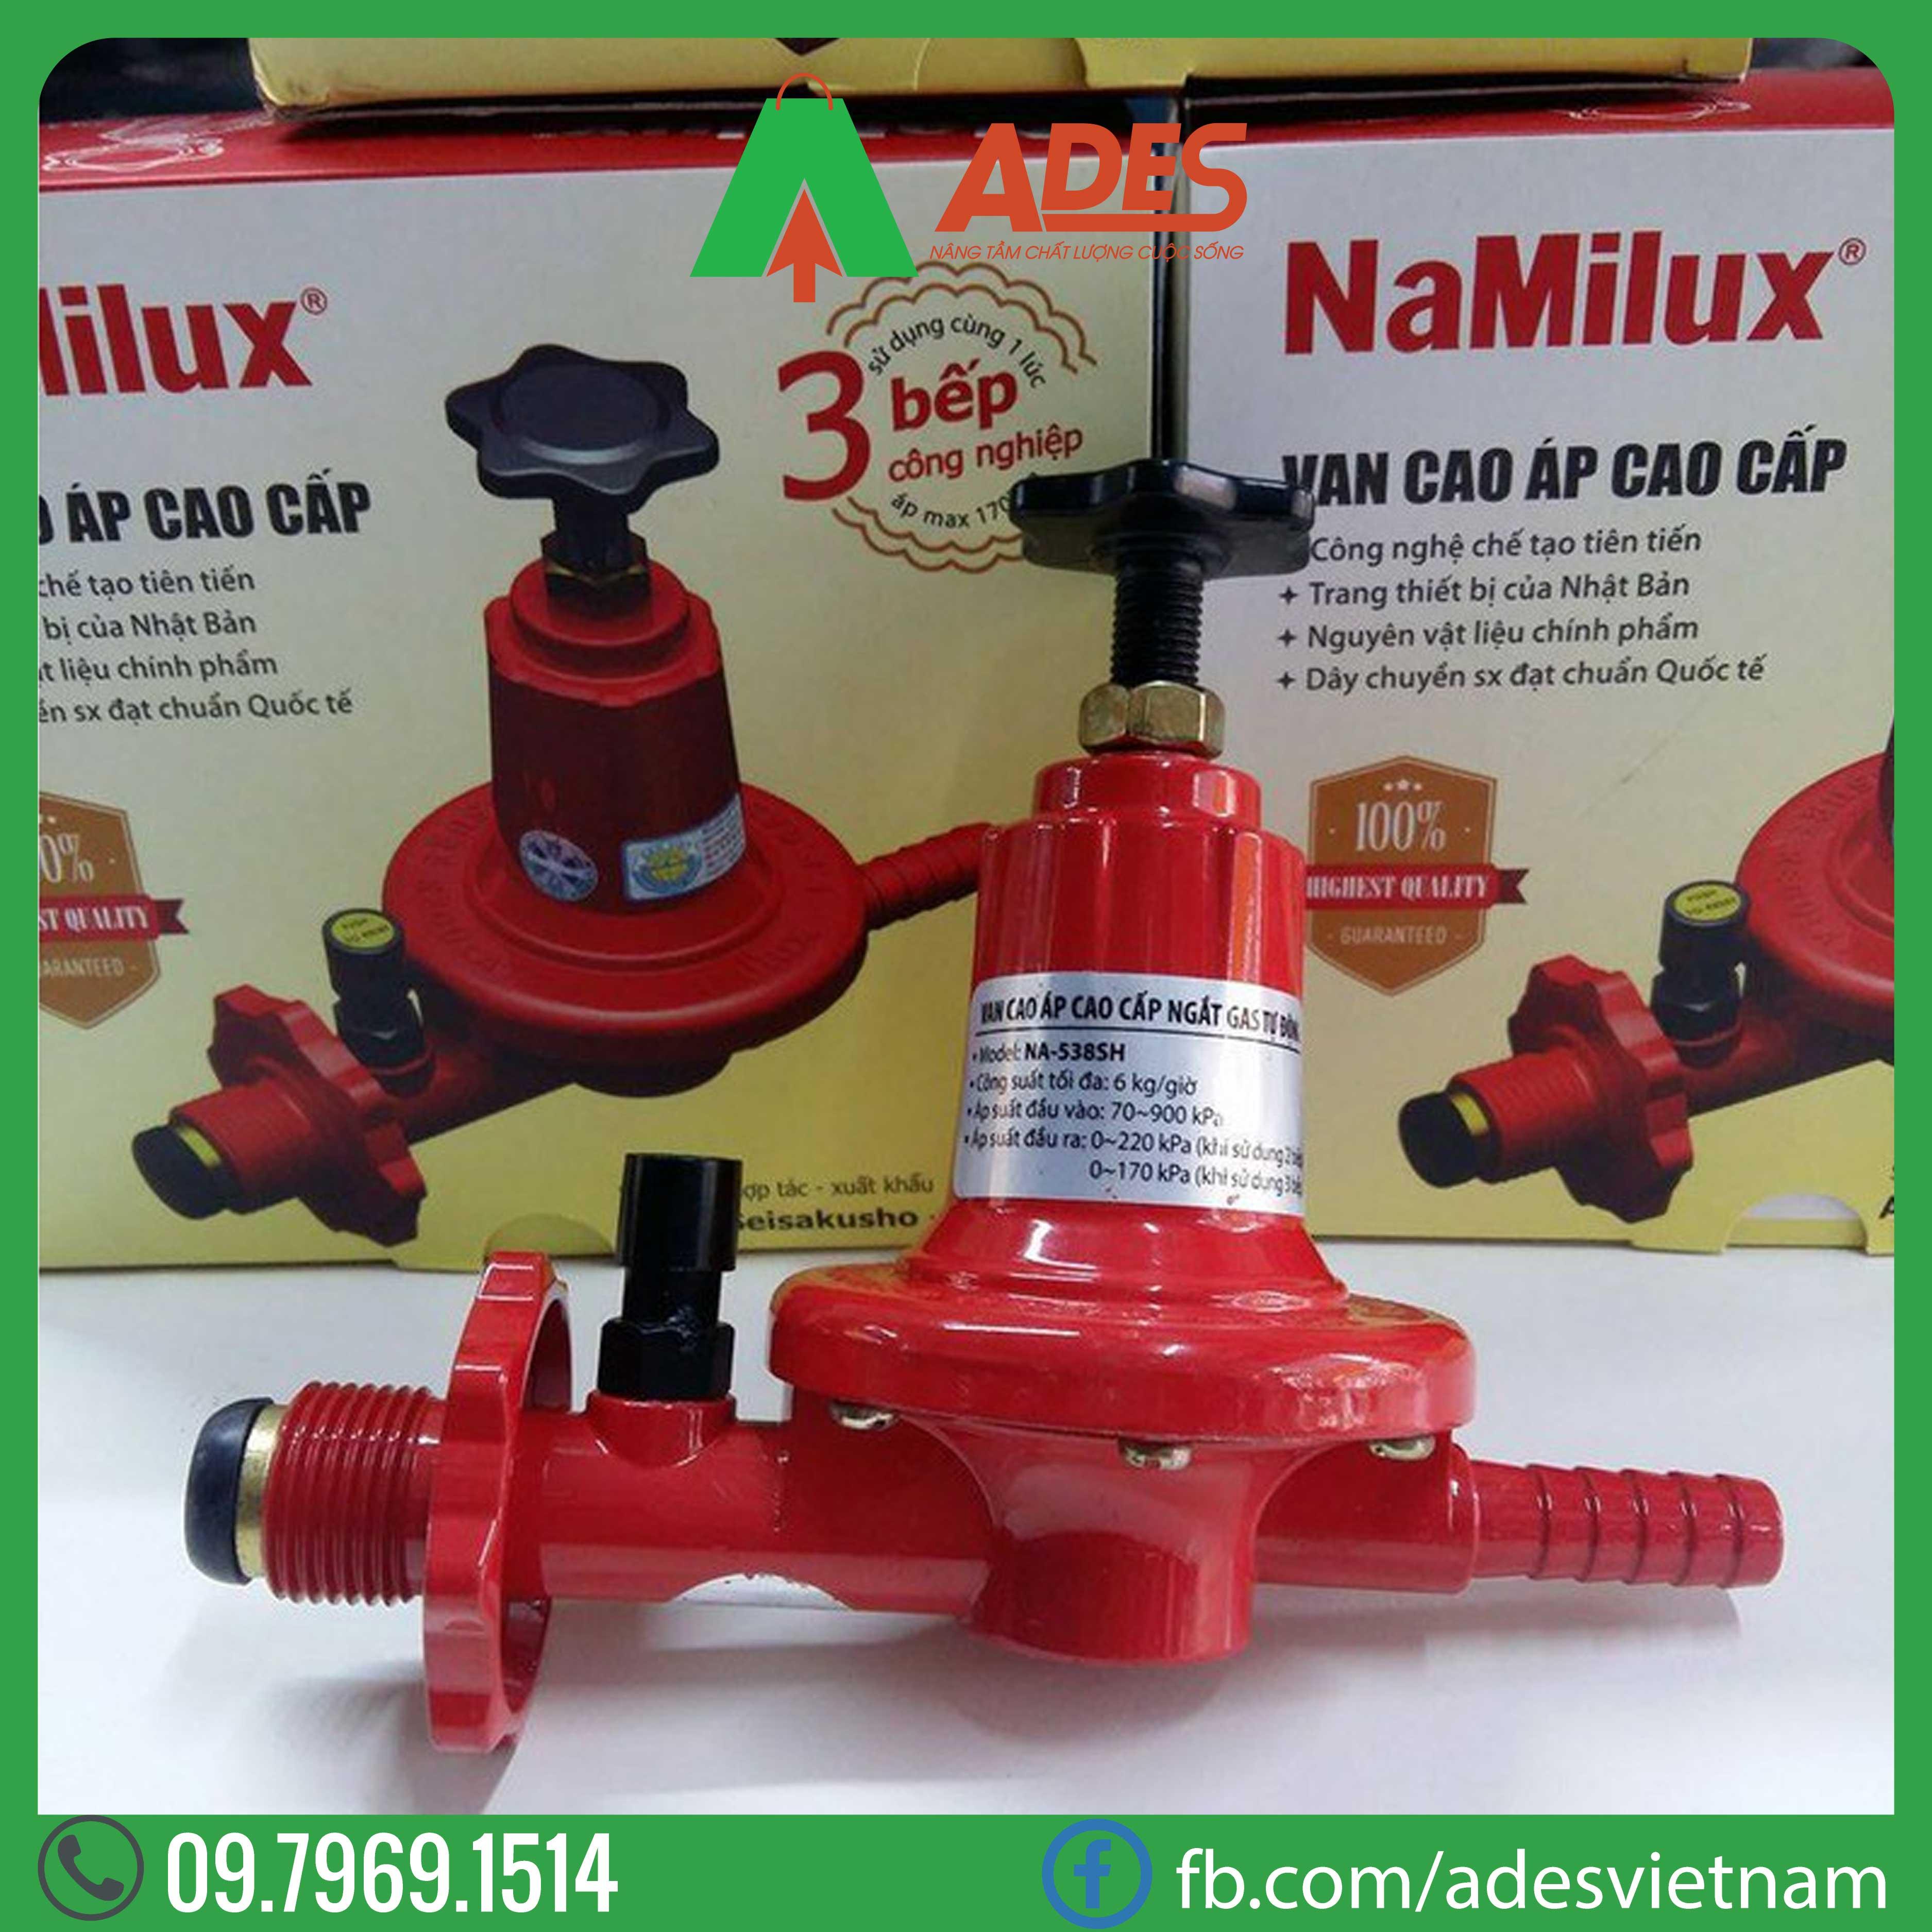 van cong nghiep Namilux NA-538SH